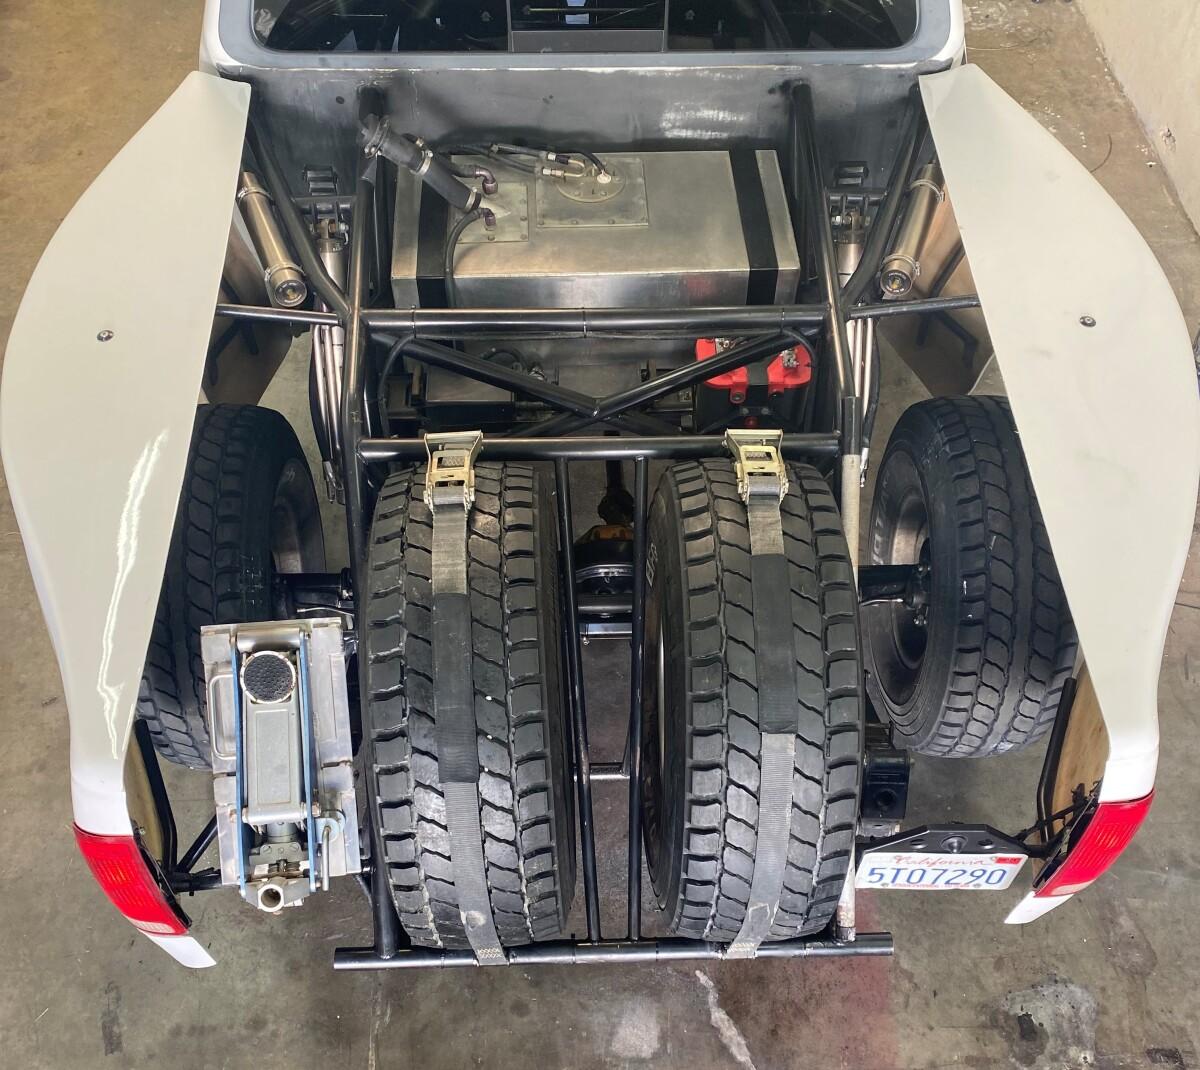 For Sale: 97 F-150 4WD Built by Harrisbuilt  - photo10